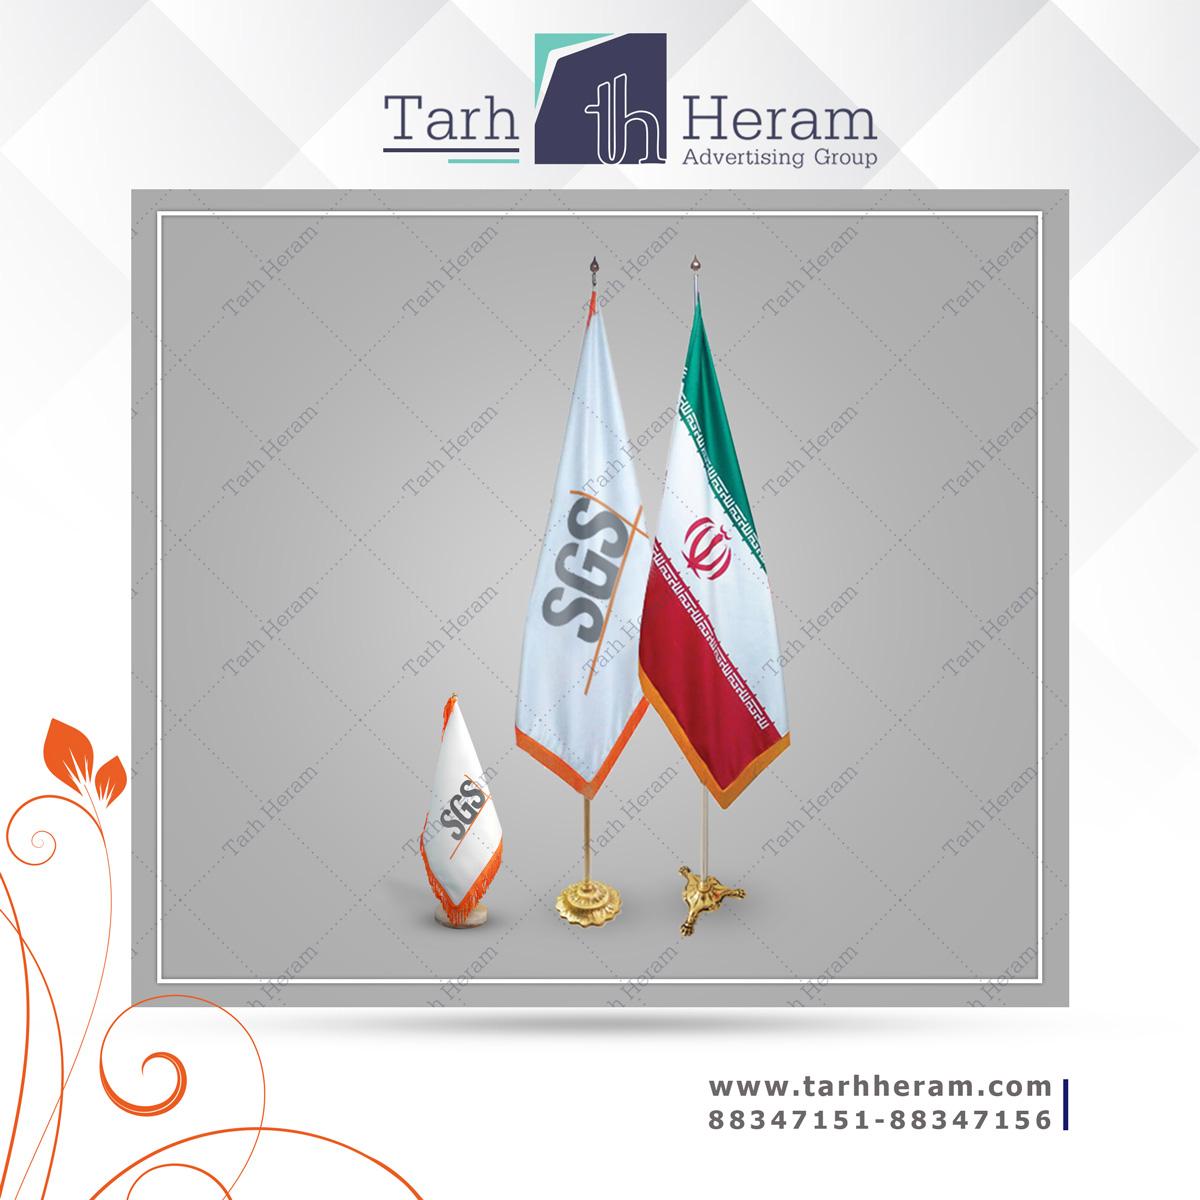 پرچم تشریفات ایران - پرچم شرکت اس جی اس SGS